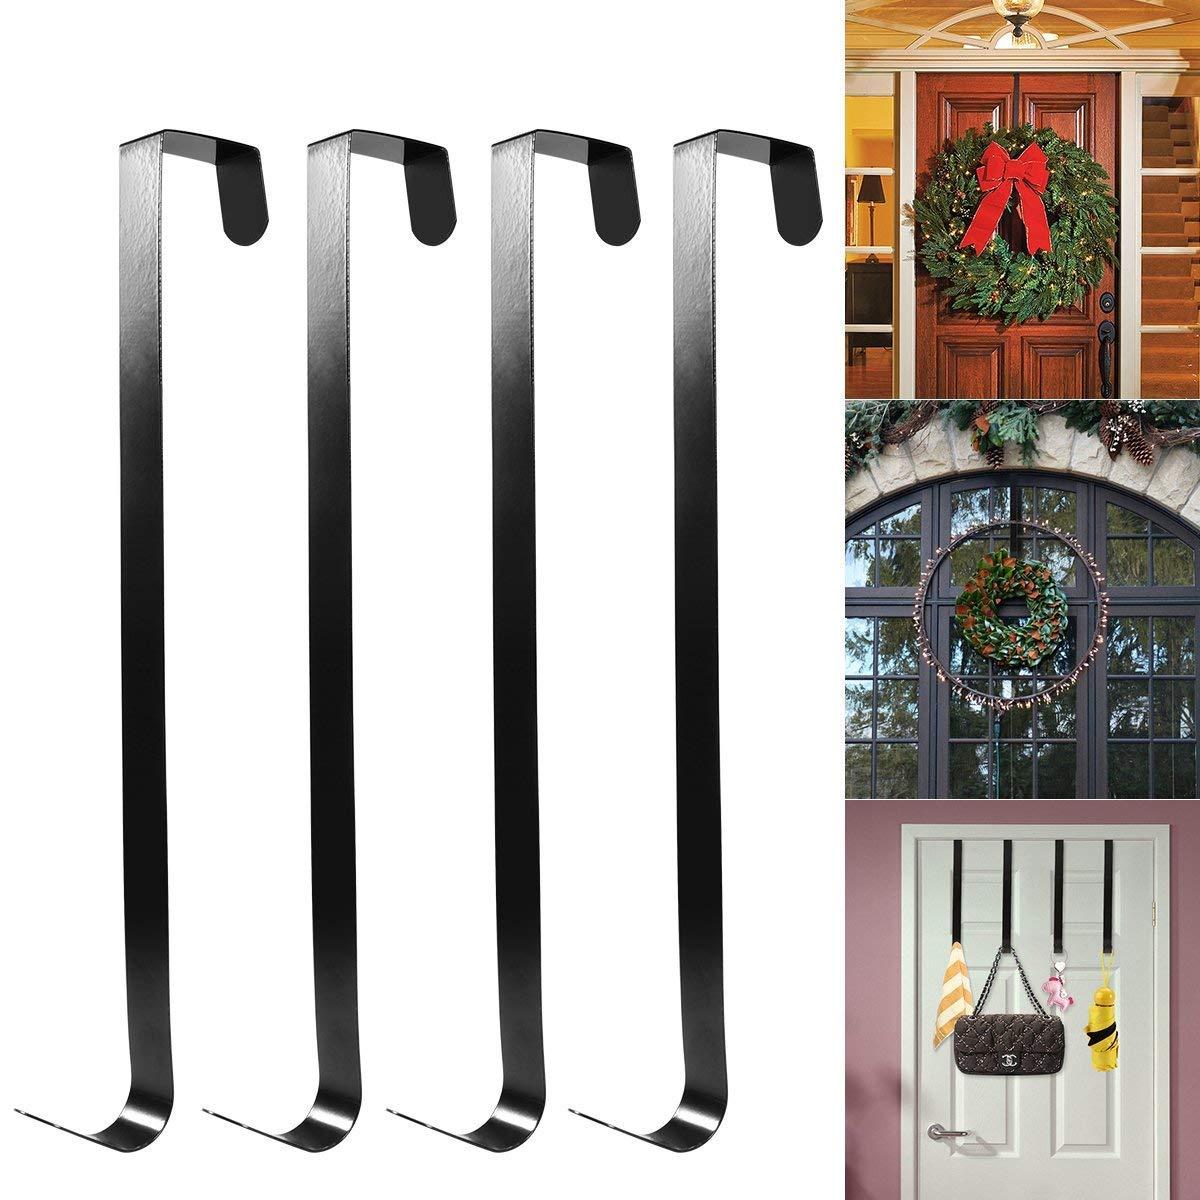 HOMEMAXS All Purpose Metal Wreath Hanger Over The Door Wreath Holder 12inch 4 Packs Black Large